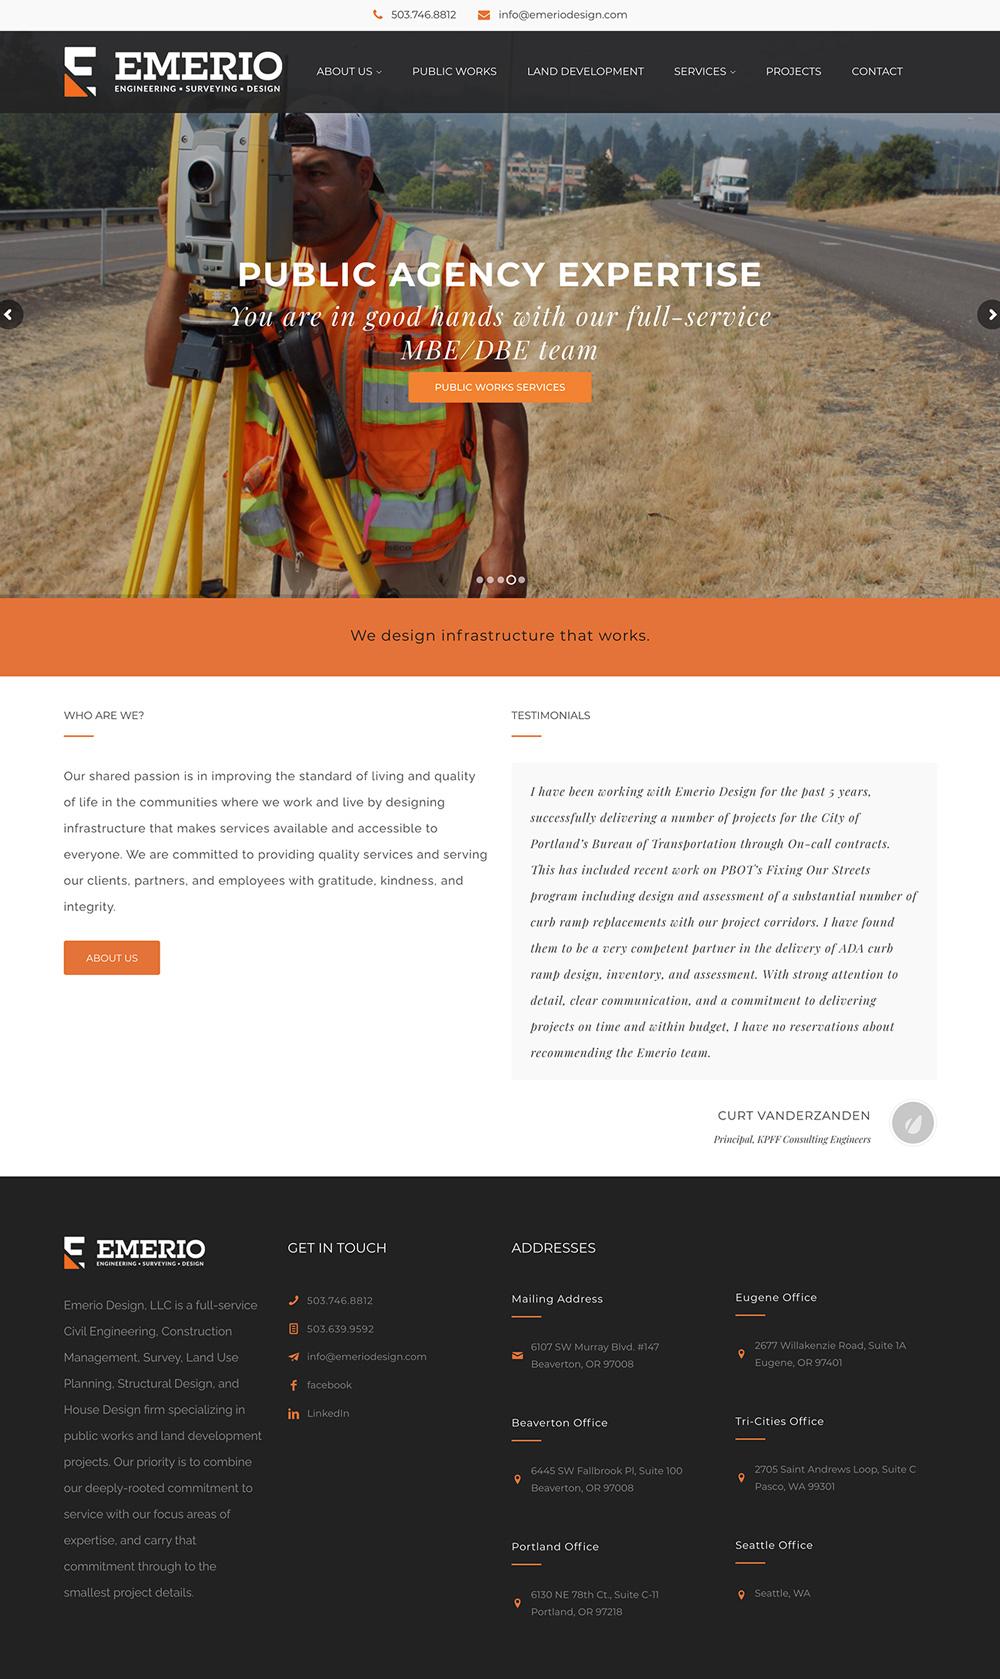 emerio-website